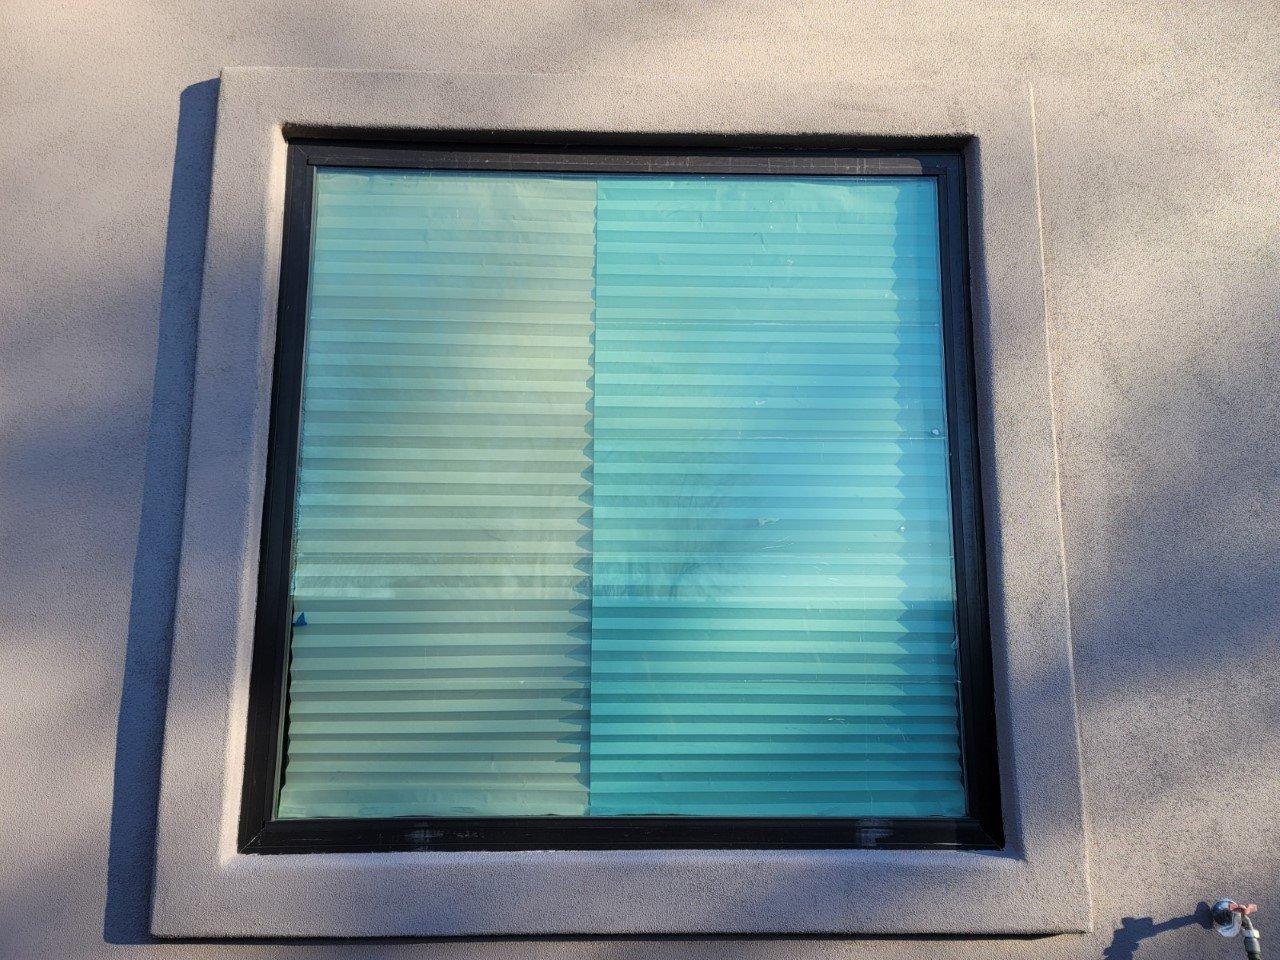 Green tinted windows